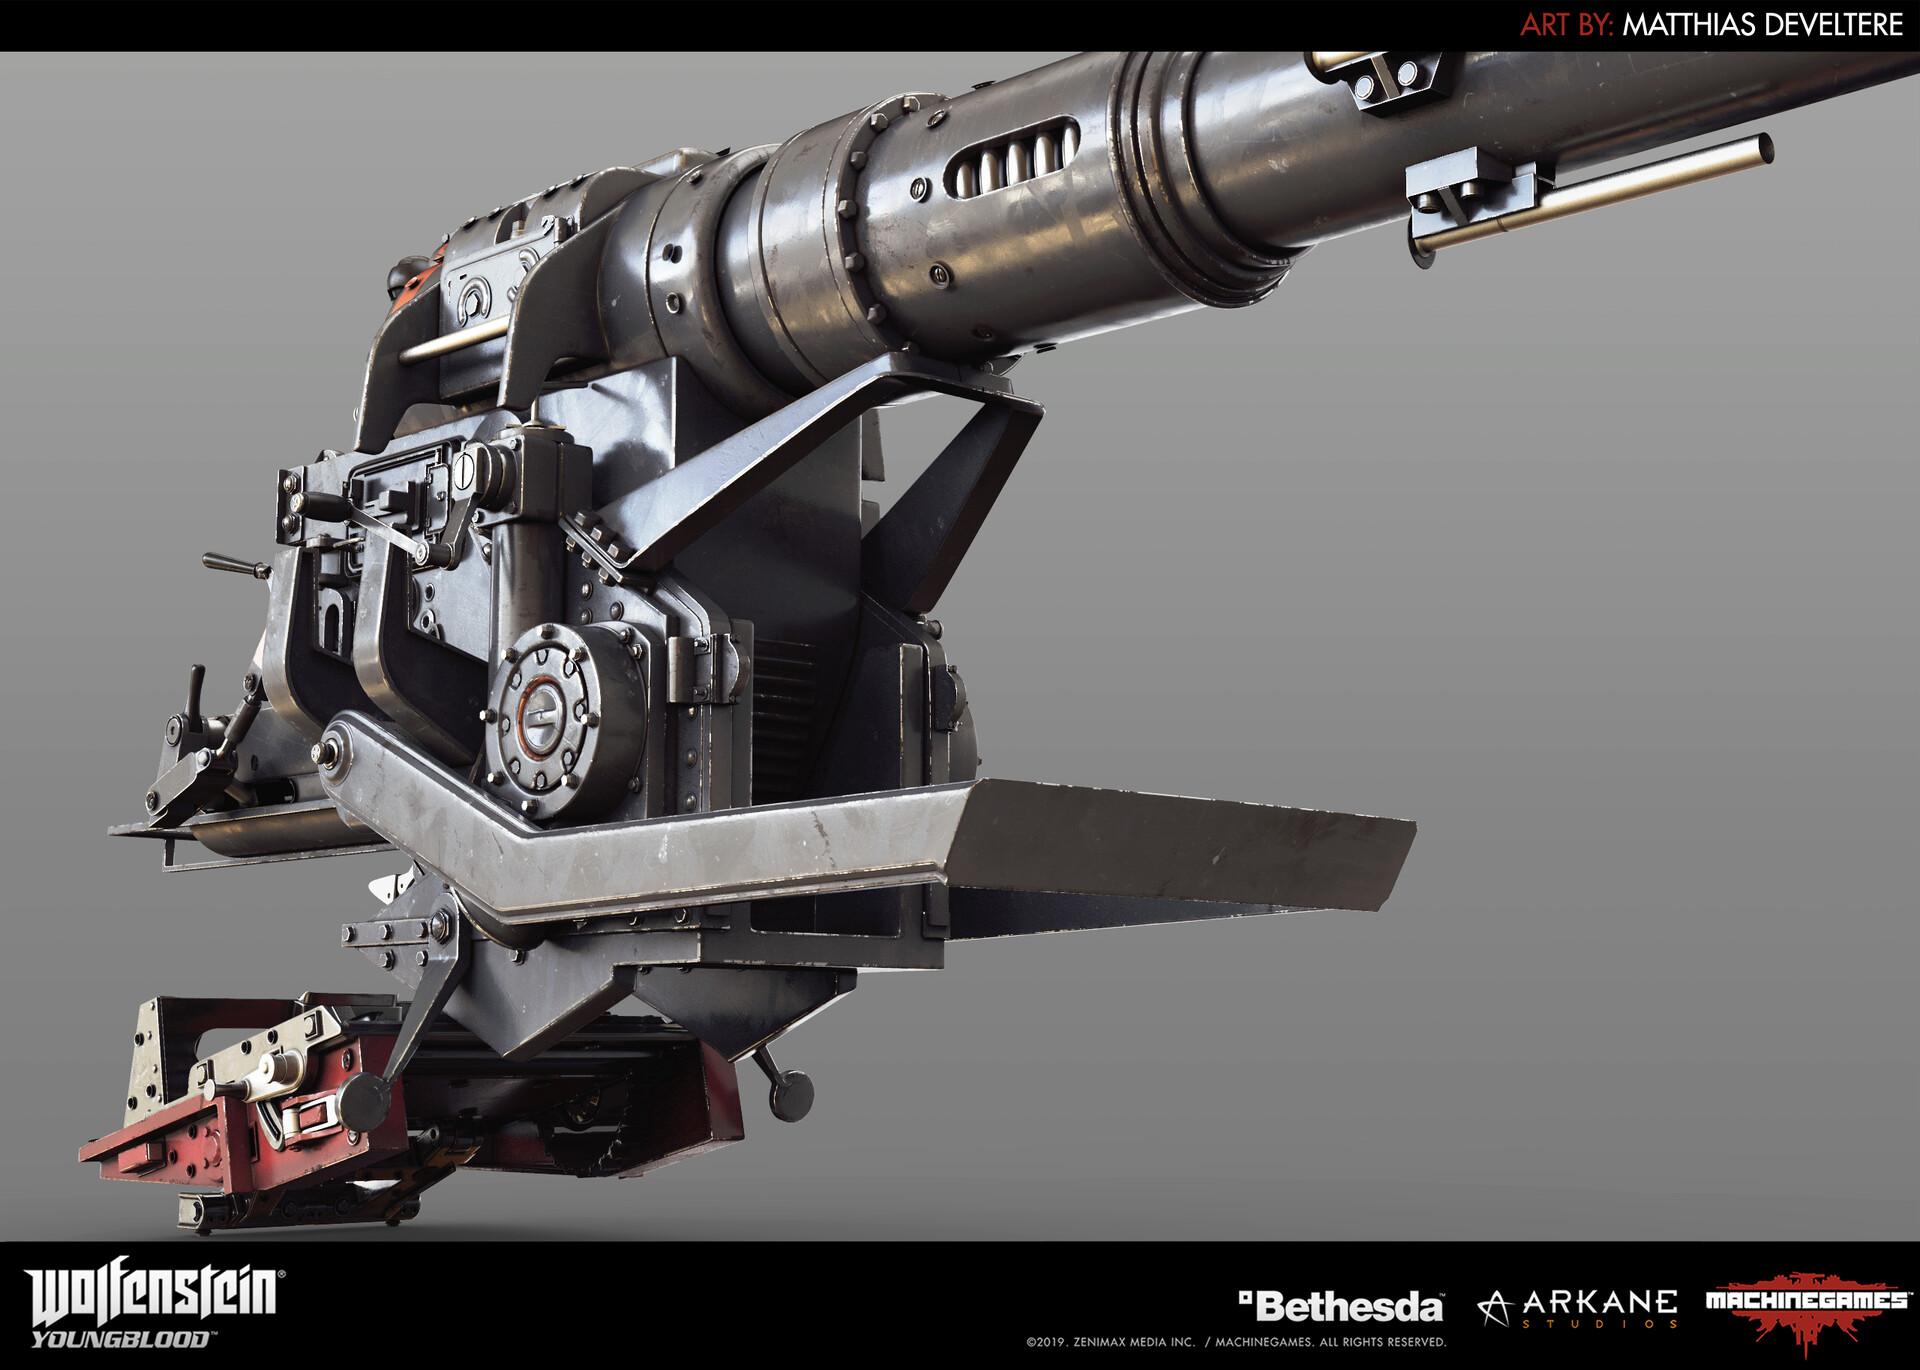 Matthias develtere artillery 1